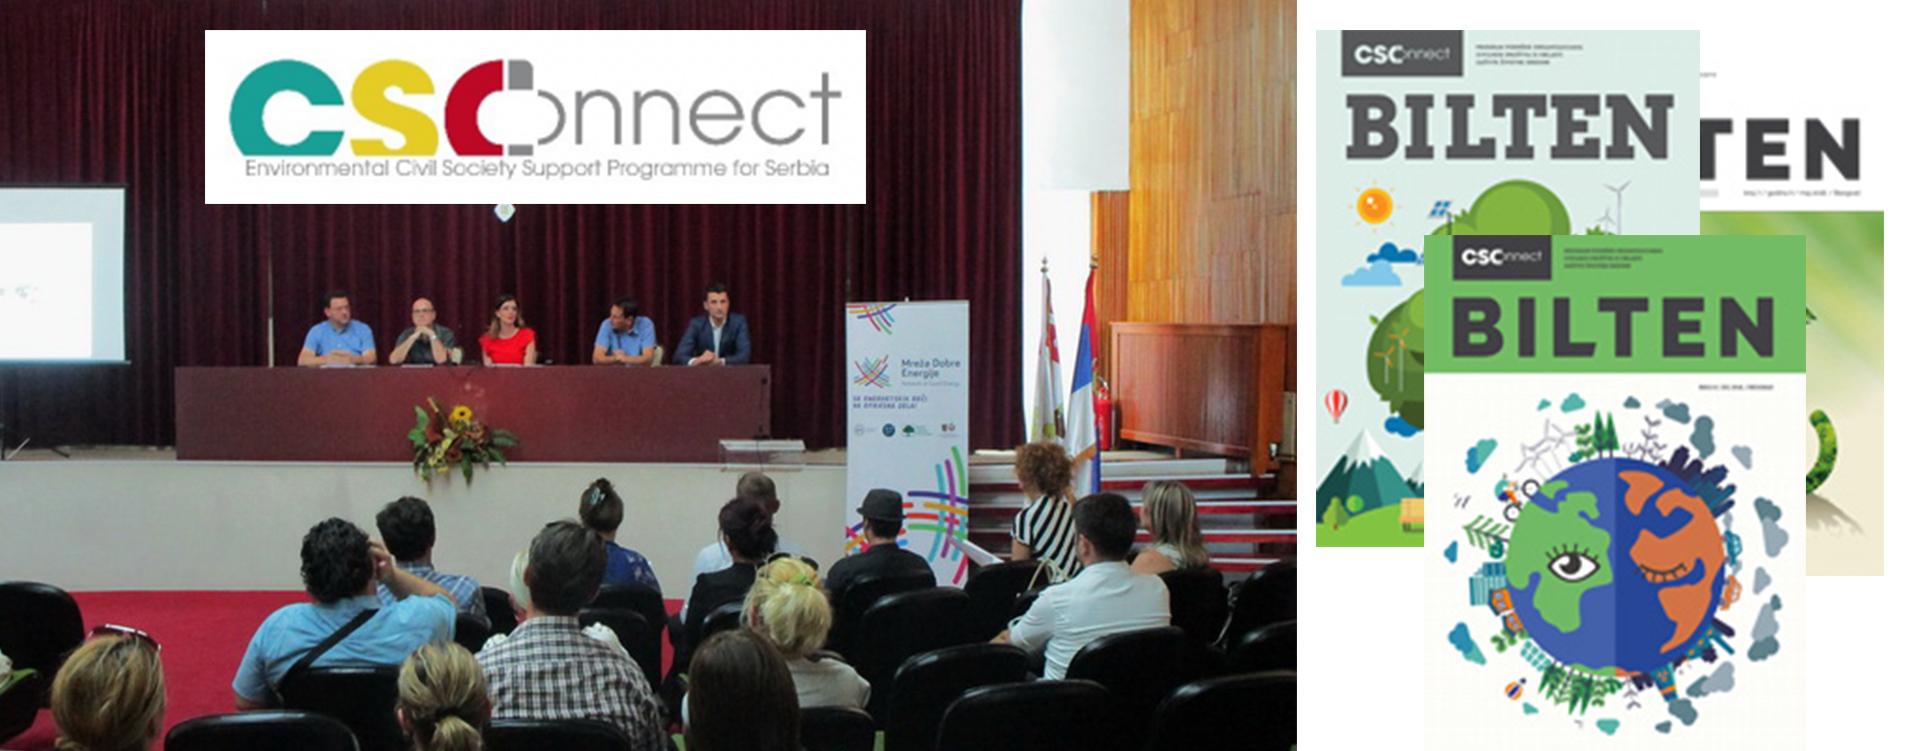 Projekat: CSOnnect (EE i zaštita prirode)